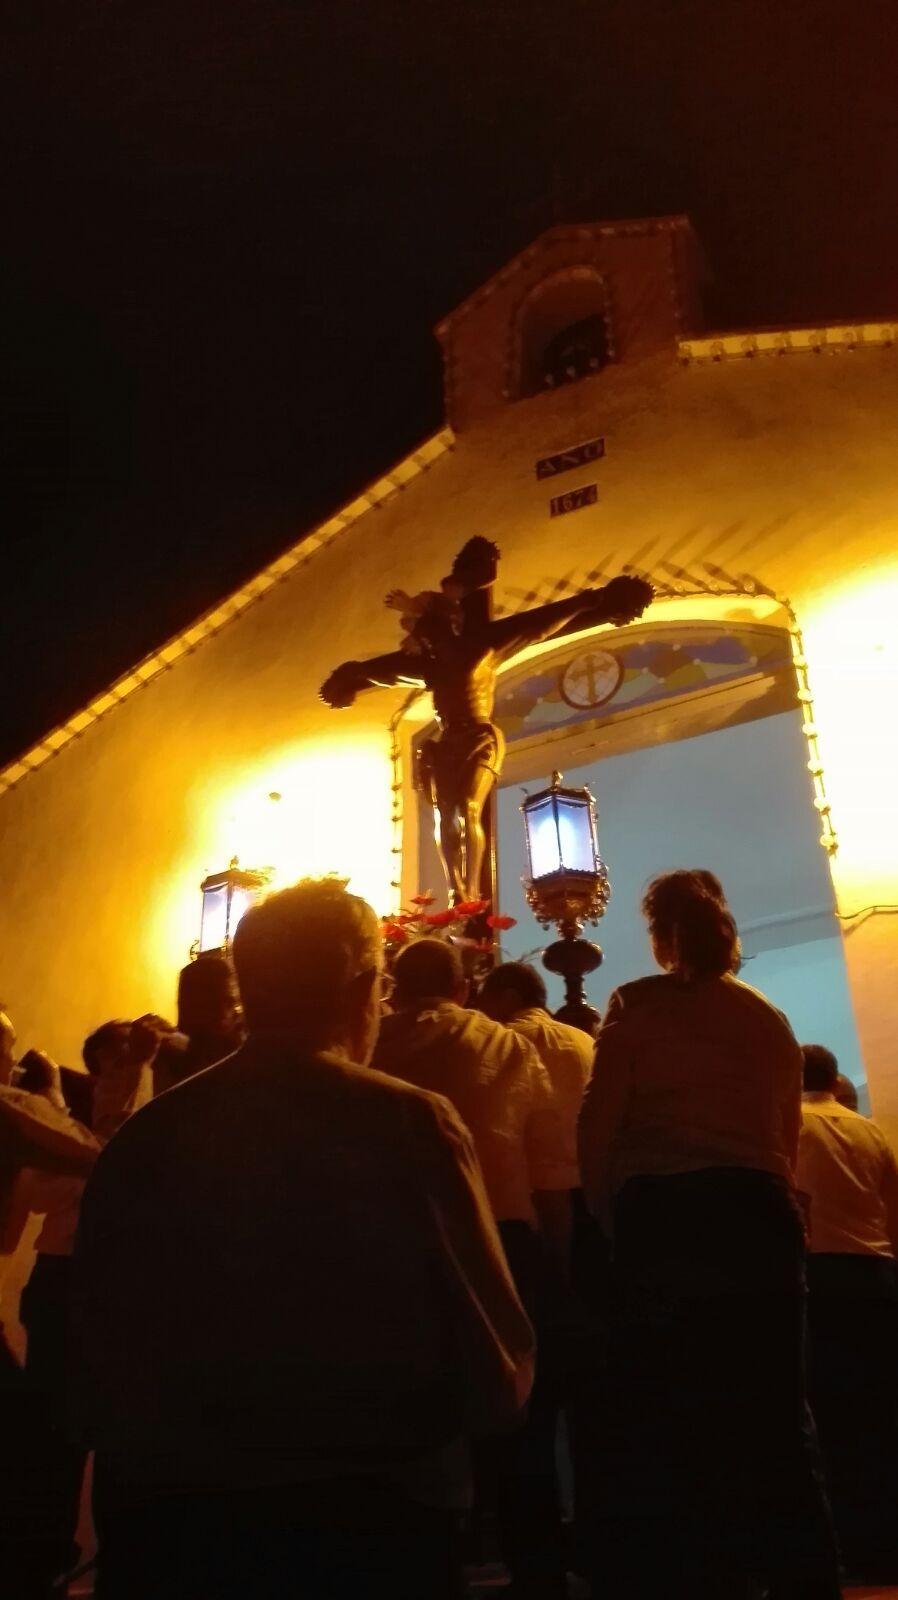 elcristo-fotografias-2016-via-crucis-50-anv-parroquia-santa-cruz-2016-09-18-ma-isabel-berenguer-01